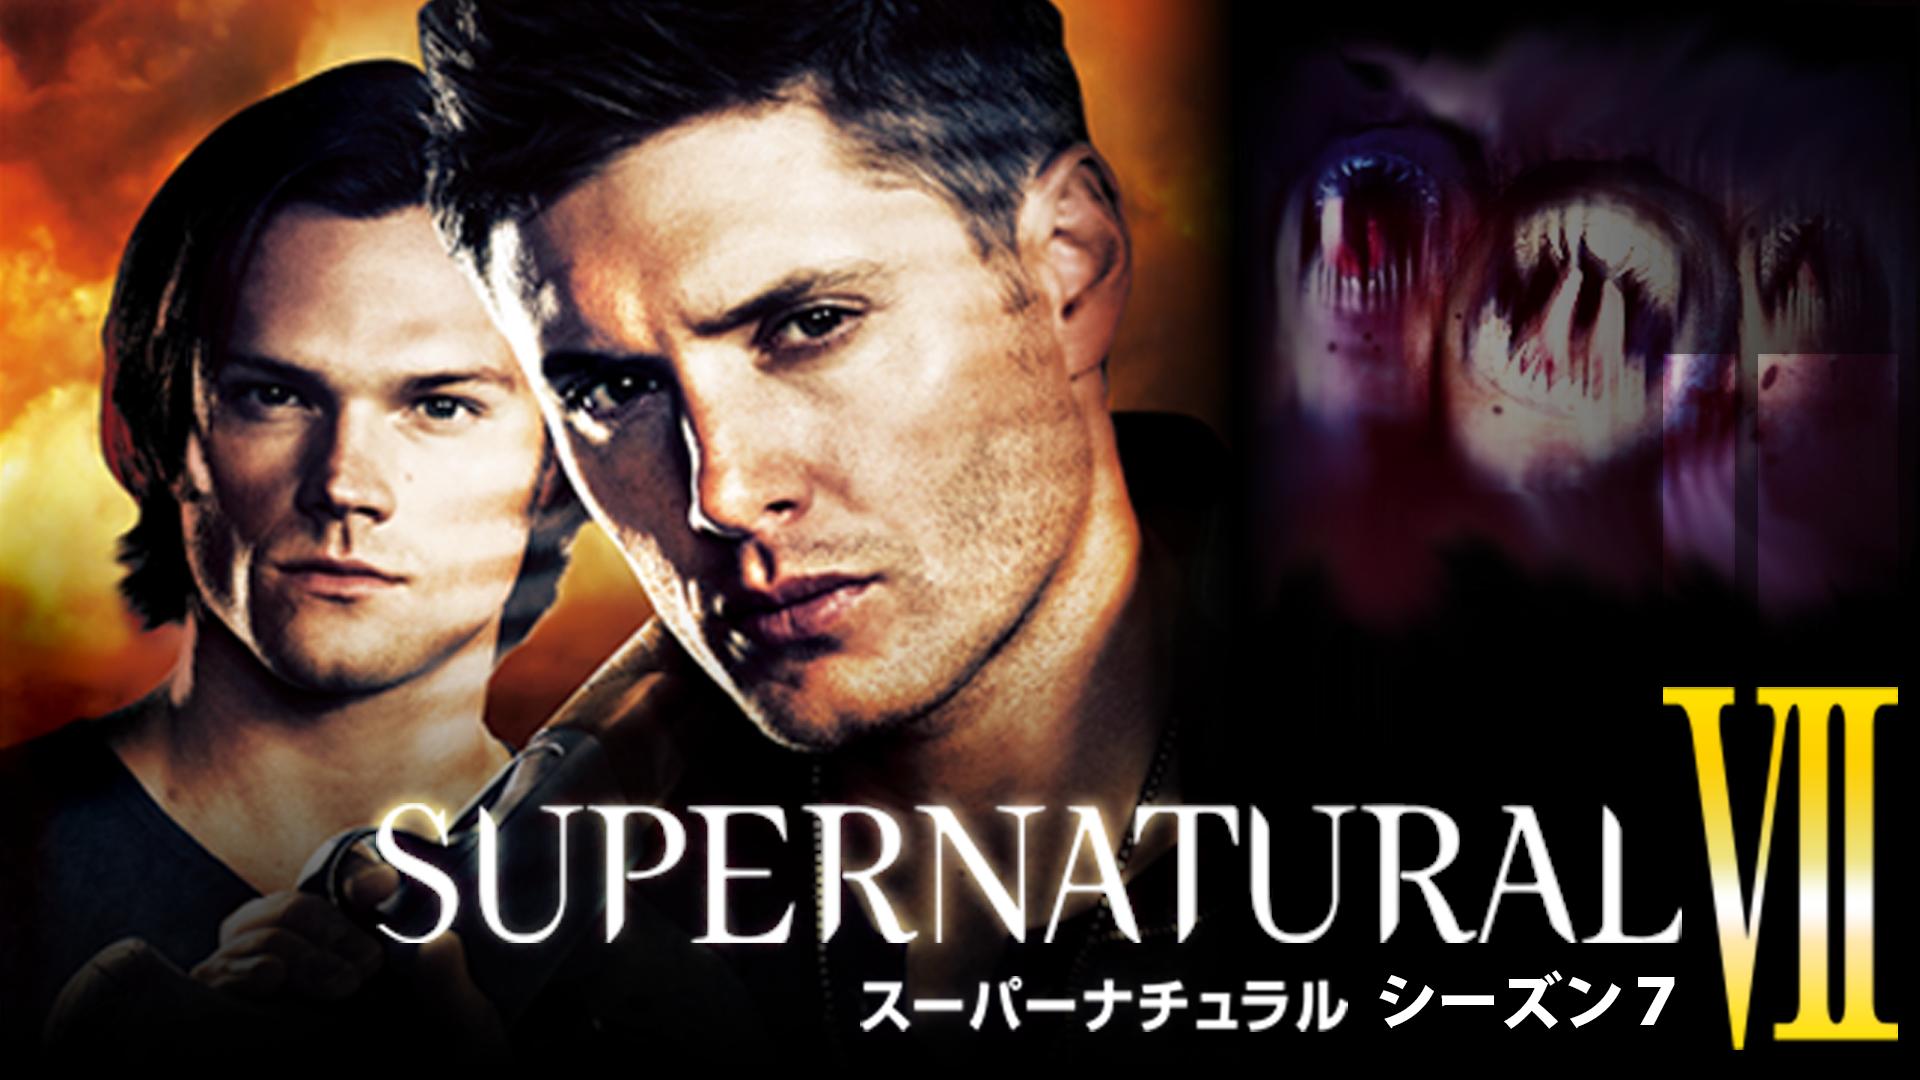 SUPERNATURAL/スーパーナチュラル シーズン7の動画 - SUPERNATURAL/スーパーナチュラル シーズン13